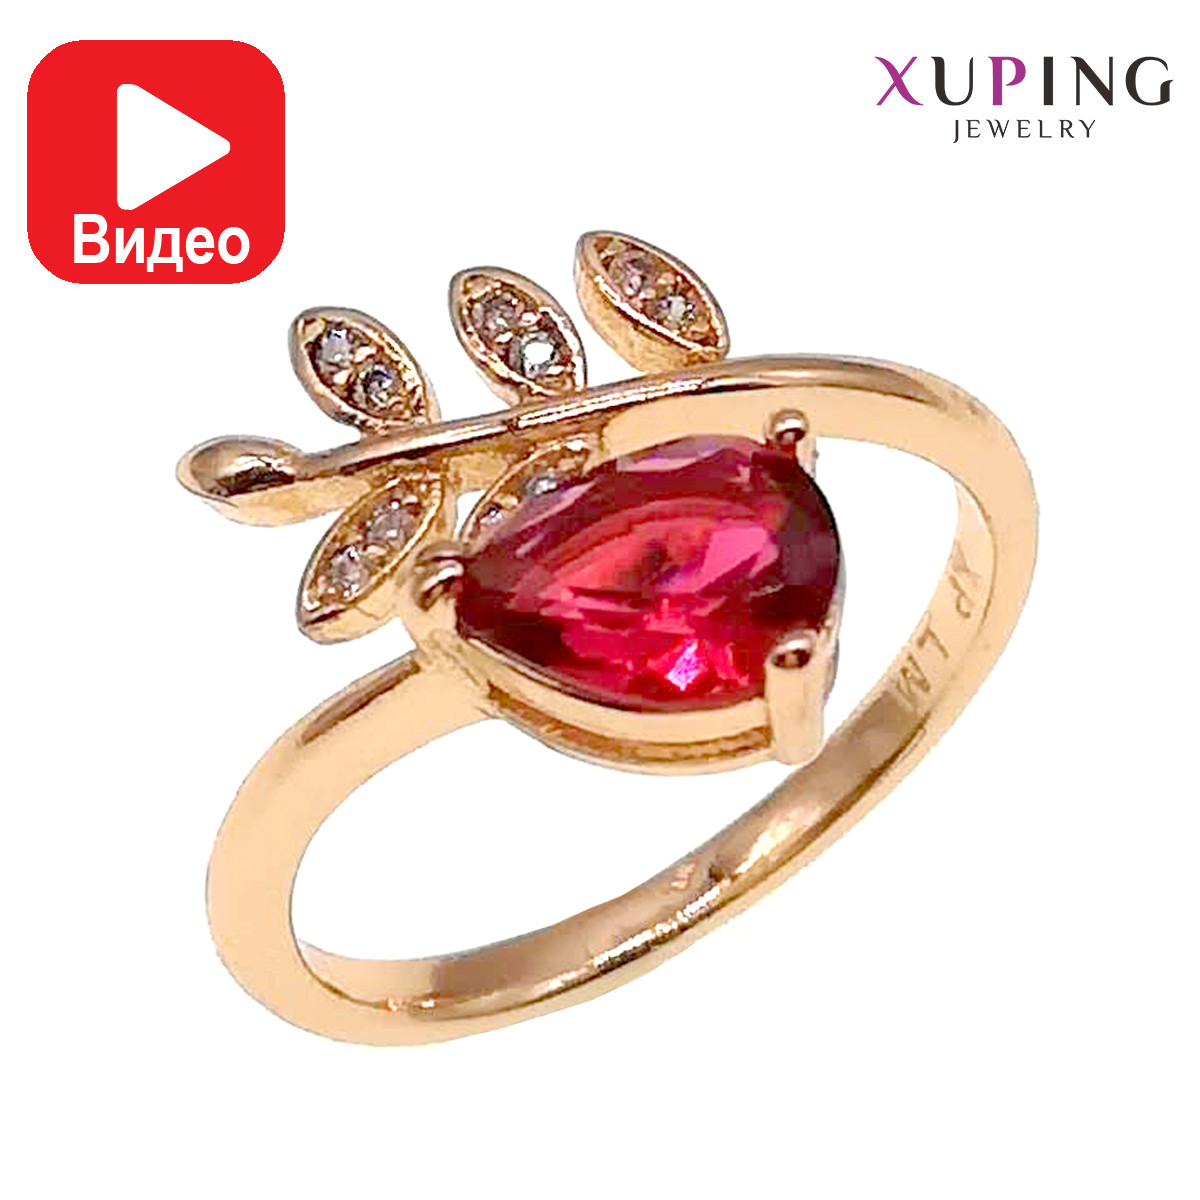 Кольцо Xuping, красный фианит (куб. цирконий), вес 4 г, позолота 18K, ХР00621 (Безрозмірна)